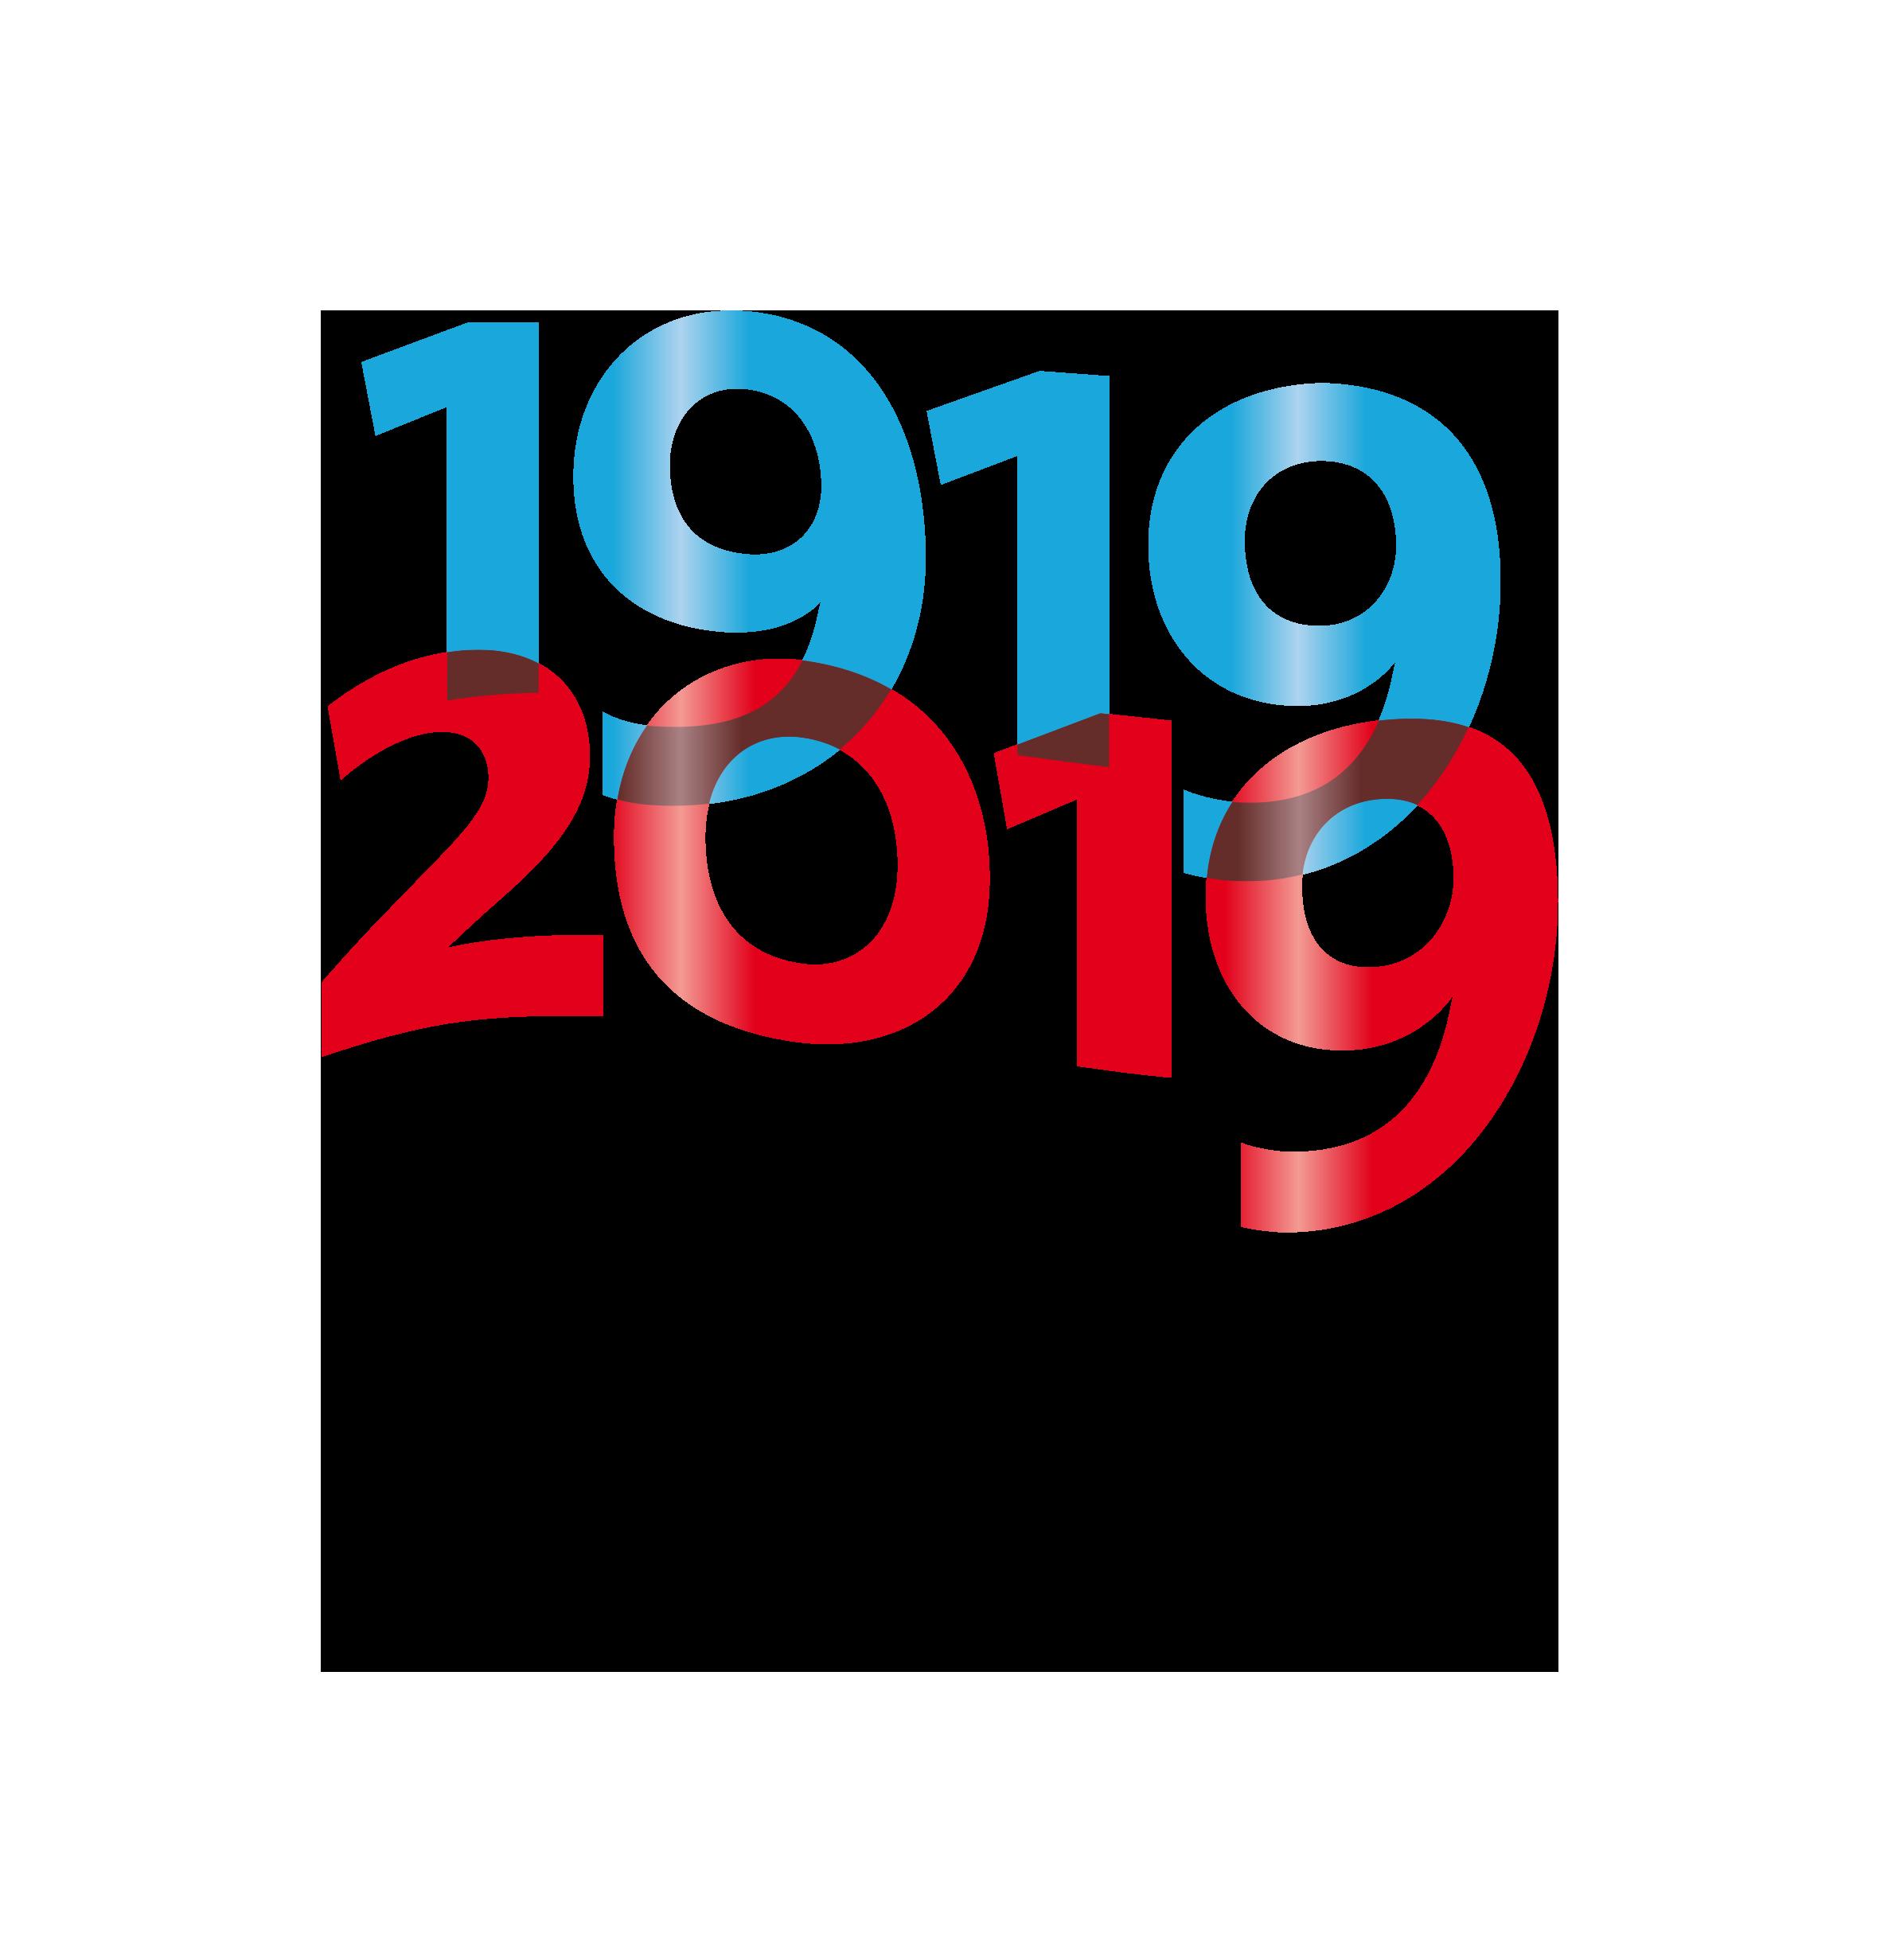 UHH Jubiläum 2019